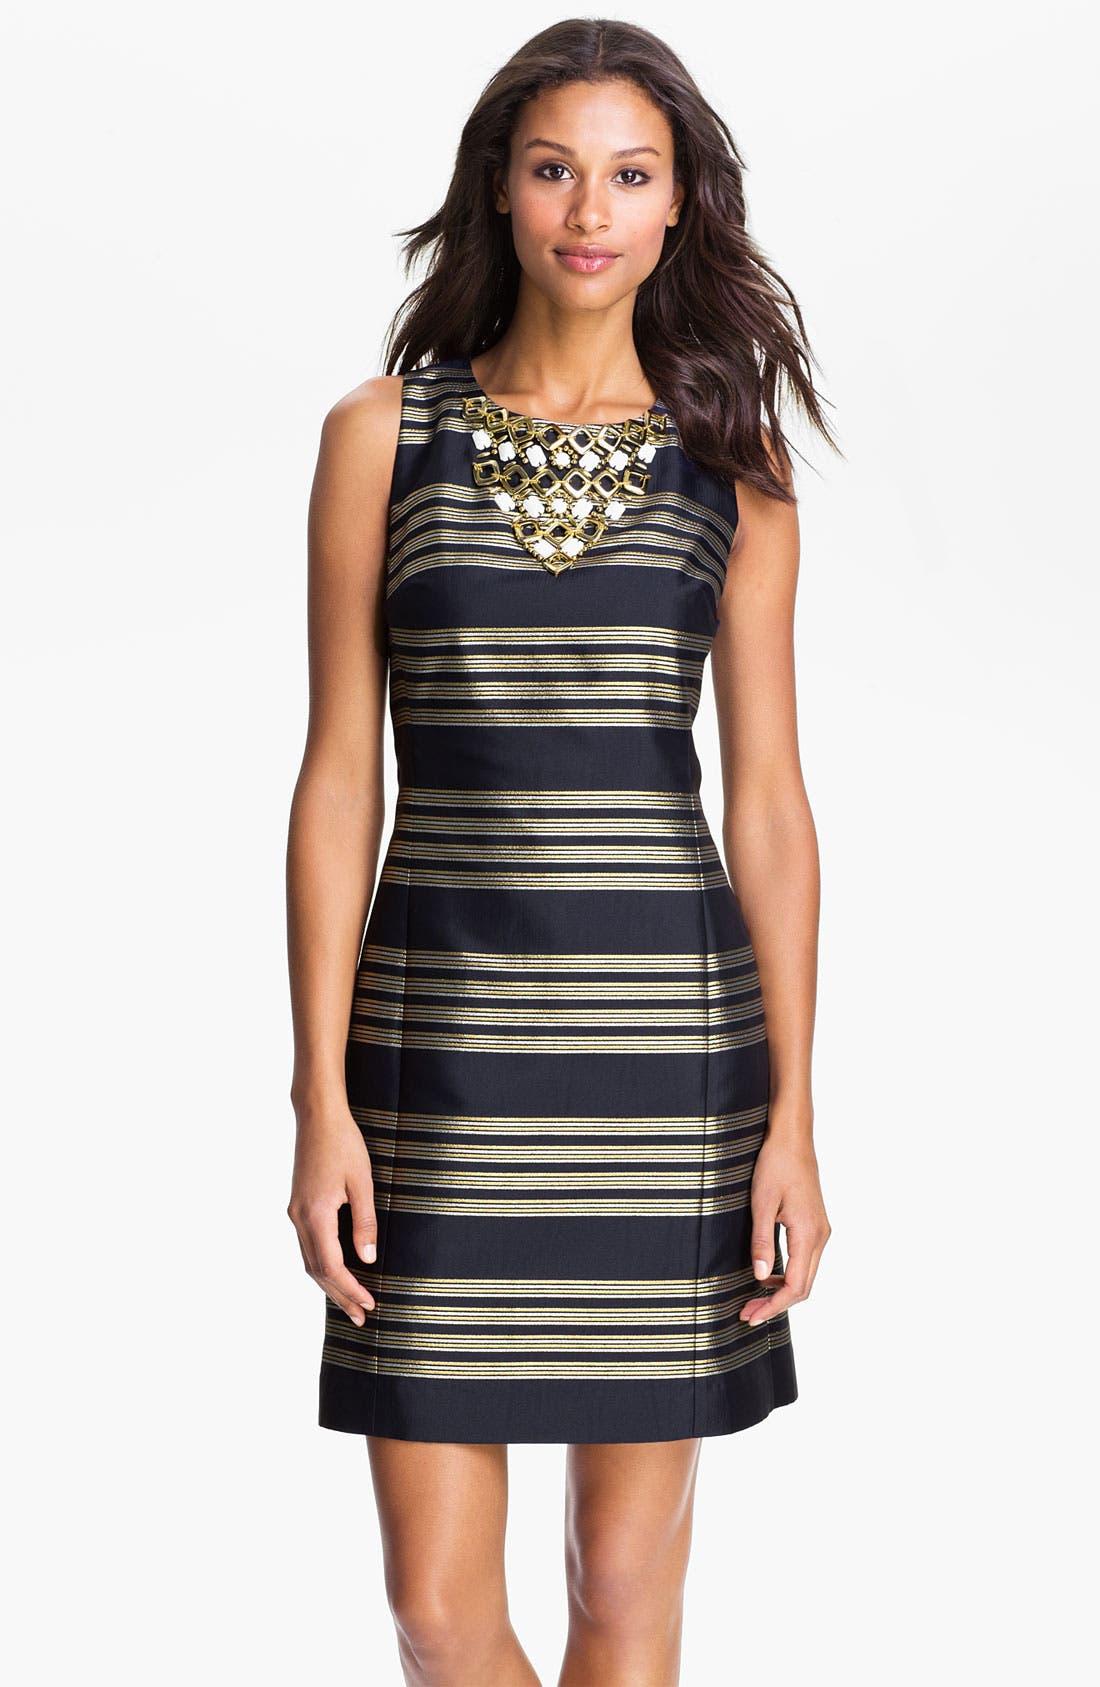 Main Image - Lilly Pulitzer® Beaded Neck Metallic Stripe Sheath Dress